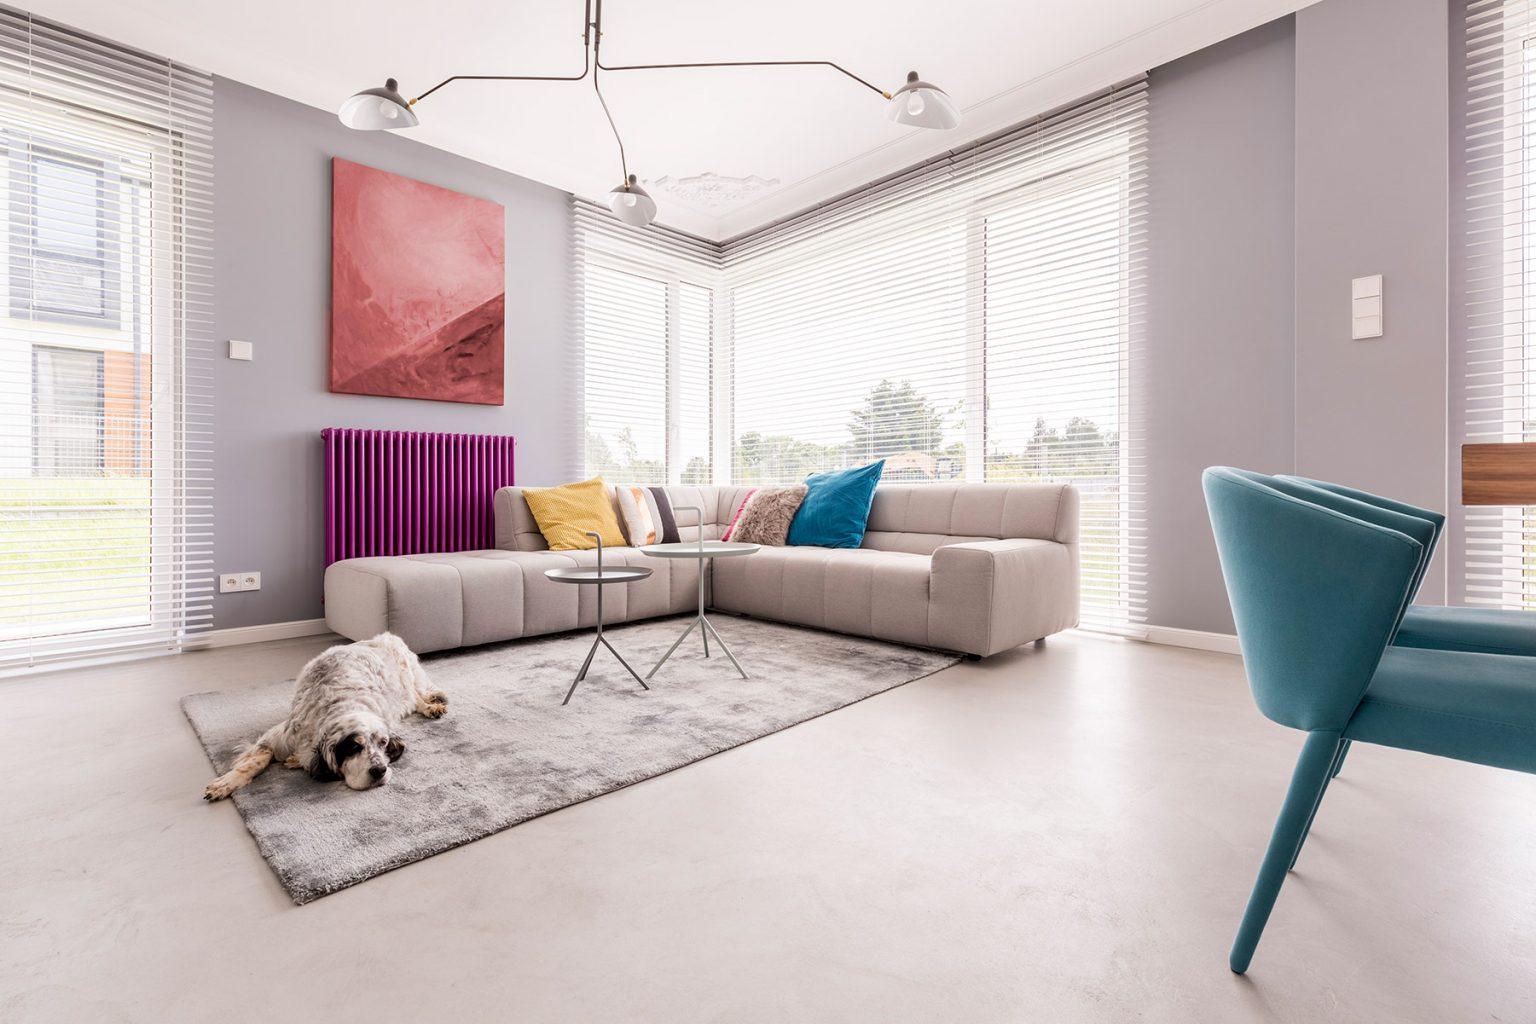 dog-in-a-house-interior-P6D5GAZ.jpg